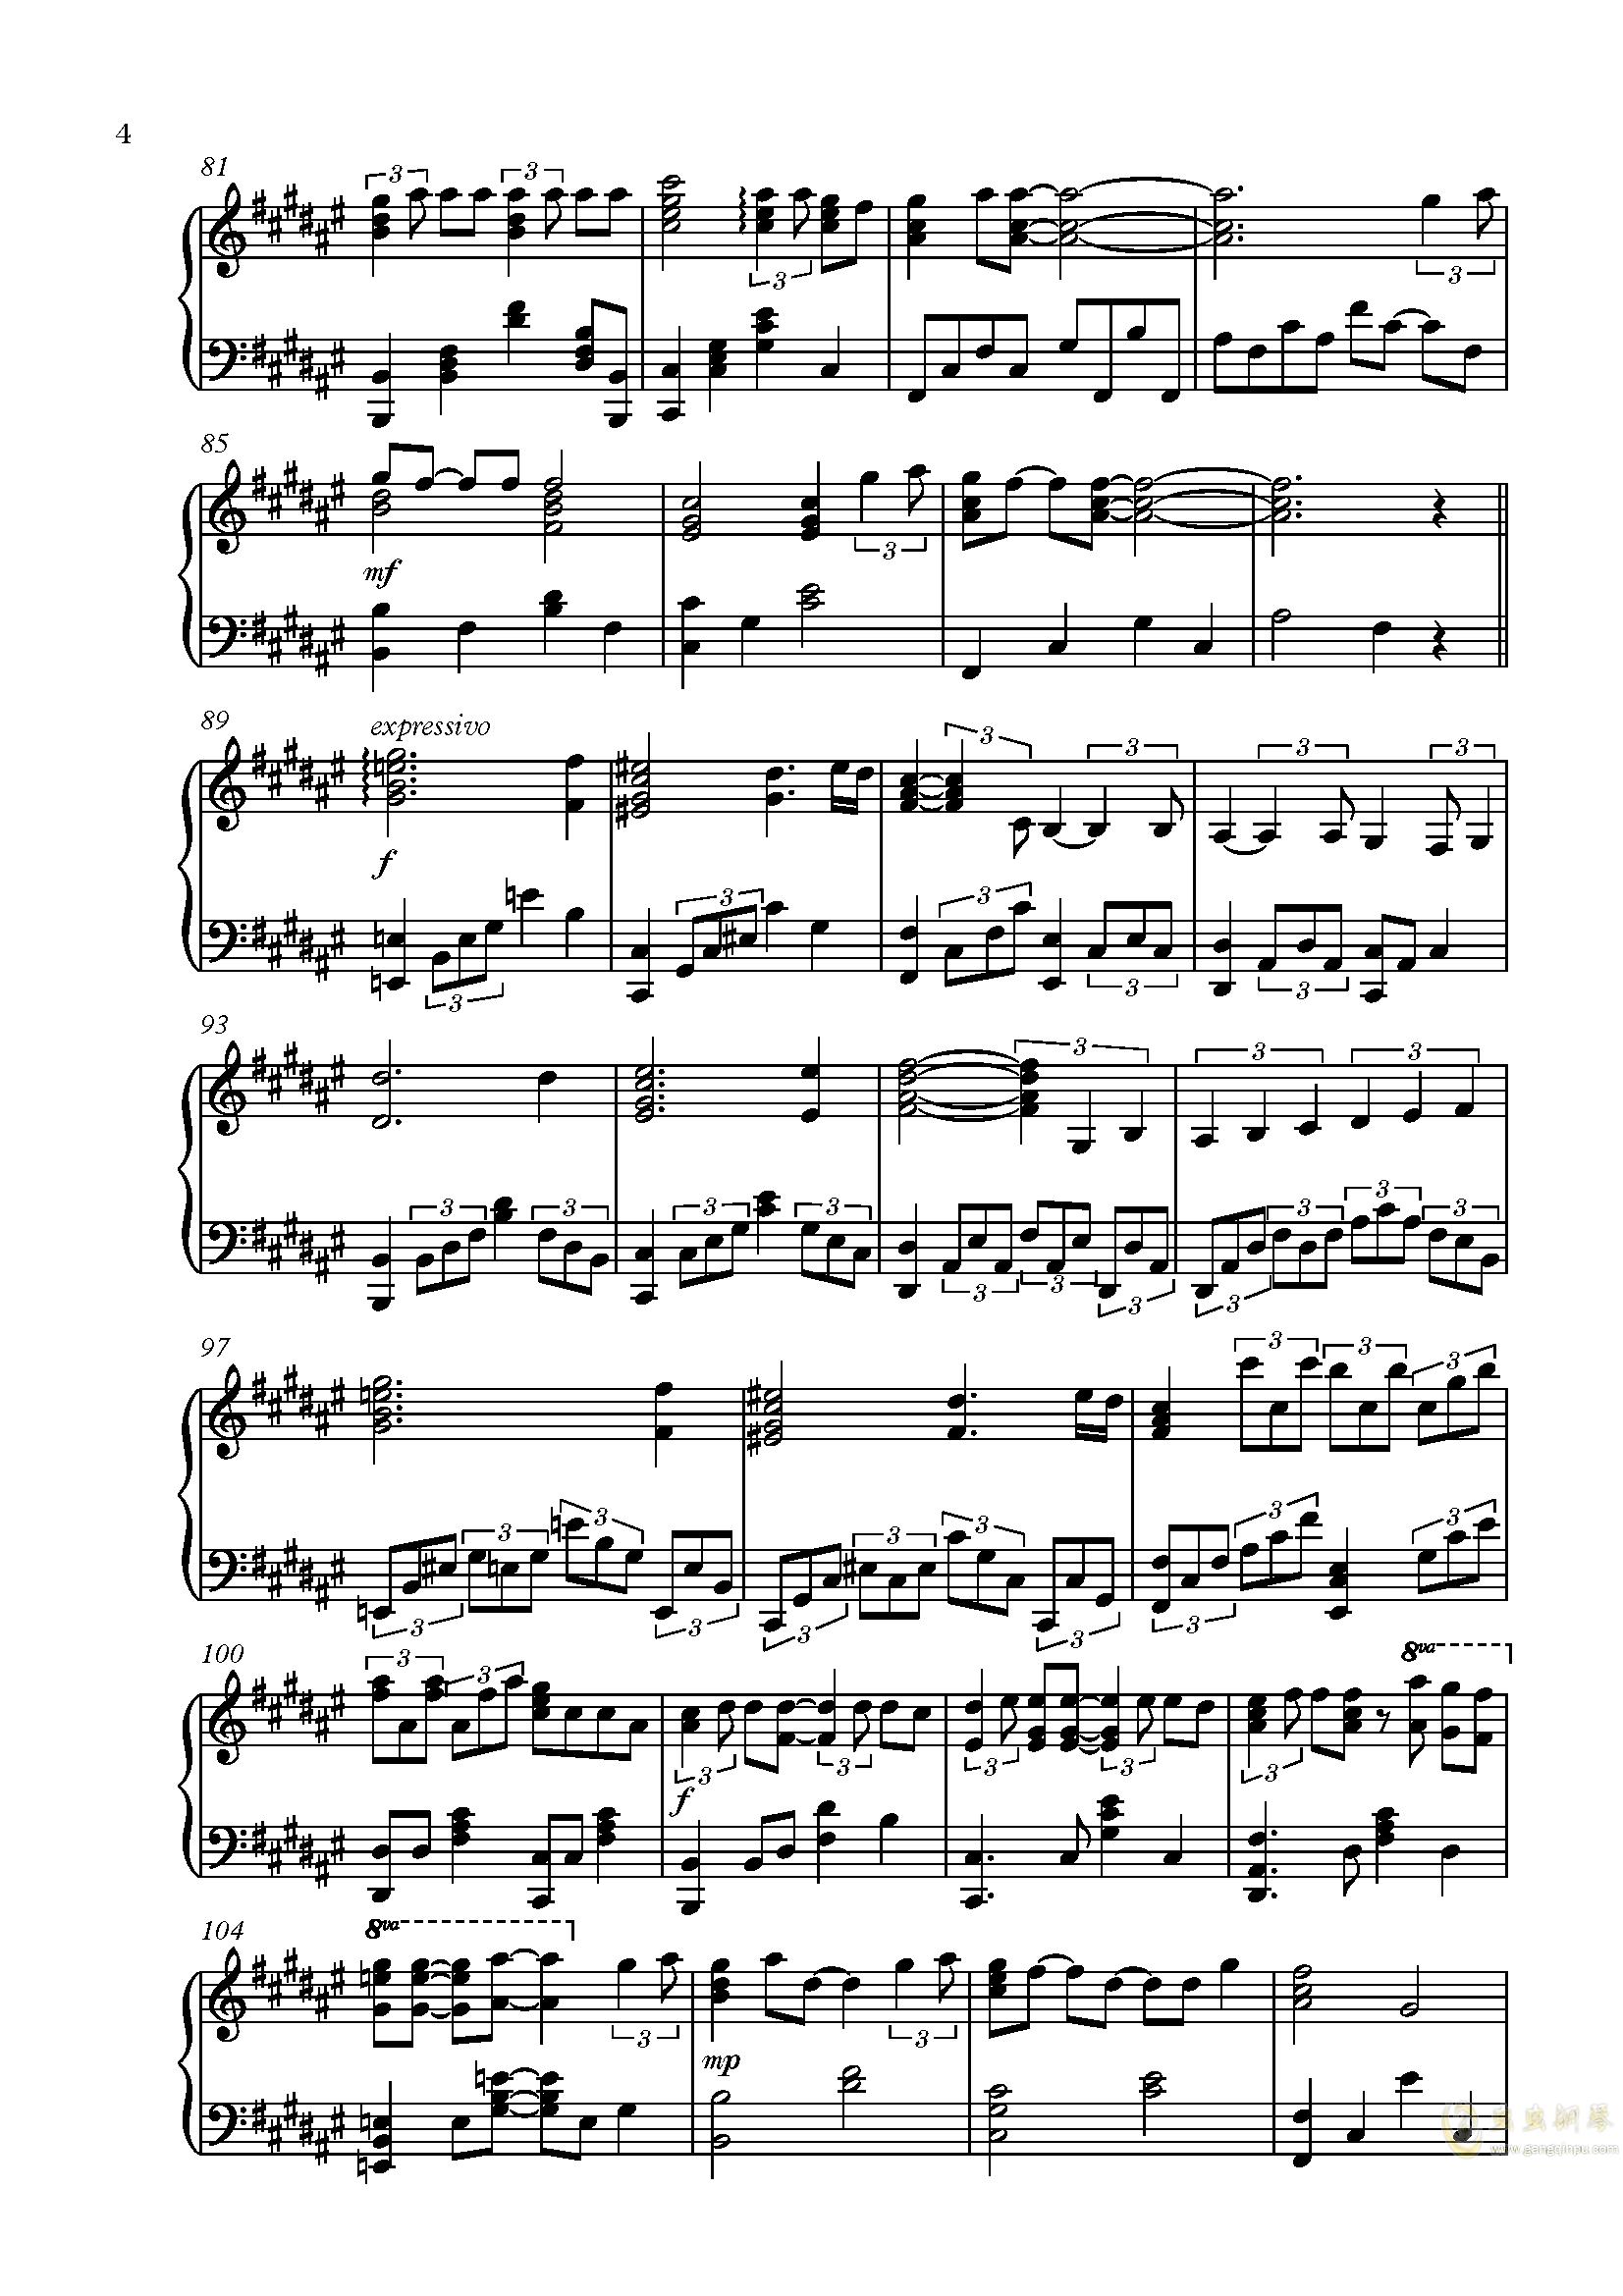 Secret Base - Anohana ED 未闻花名/我们仍未知道那天所看见的花的名字钢琴谱 第4页